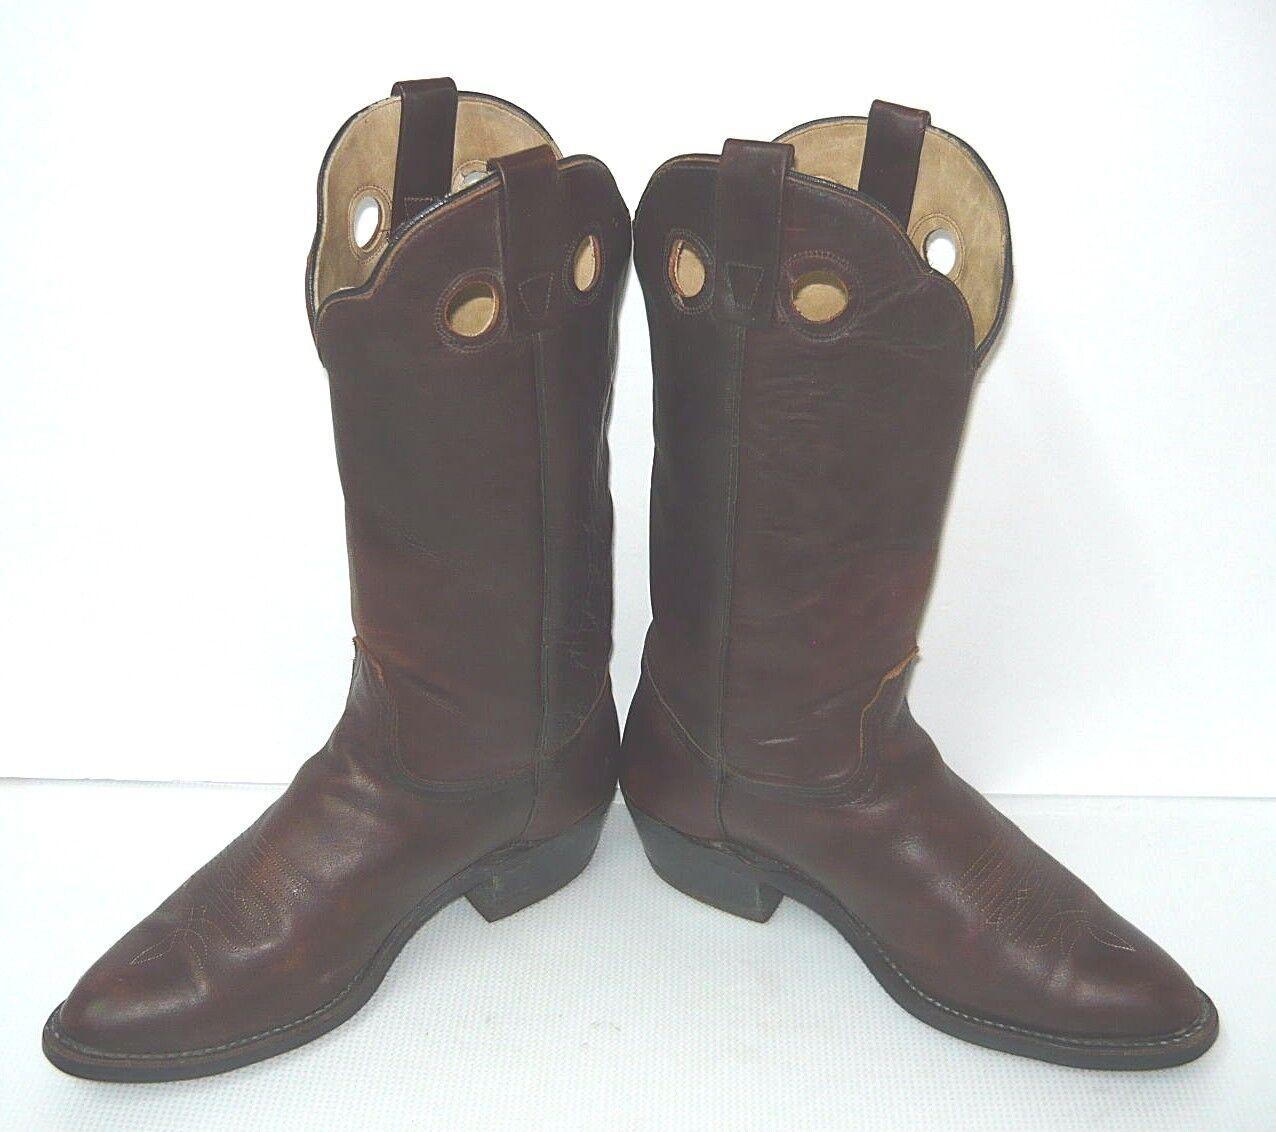 Vintage Goodyear braun Leather Upper Cowboy Western Stiefel Stiefel Stiefel Sz 10.5D 557385